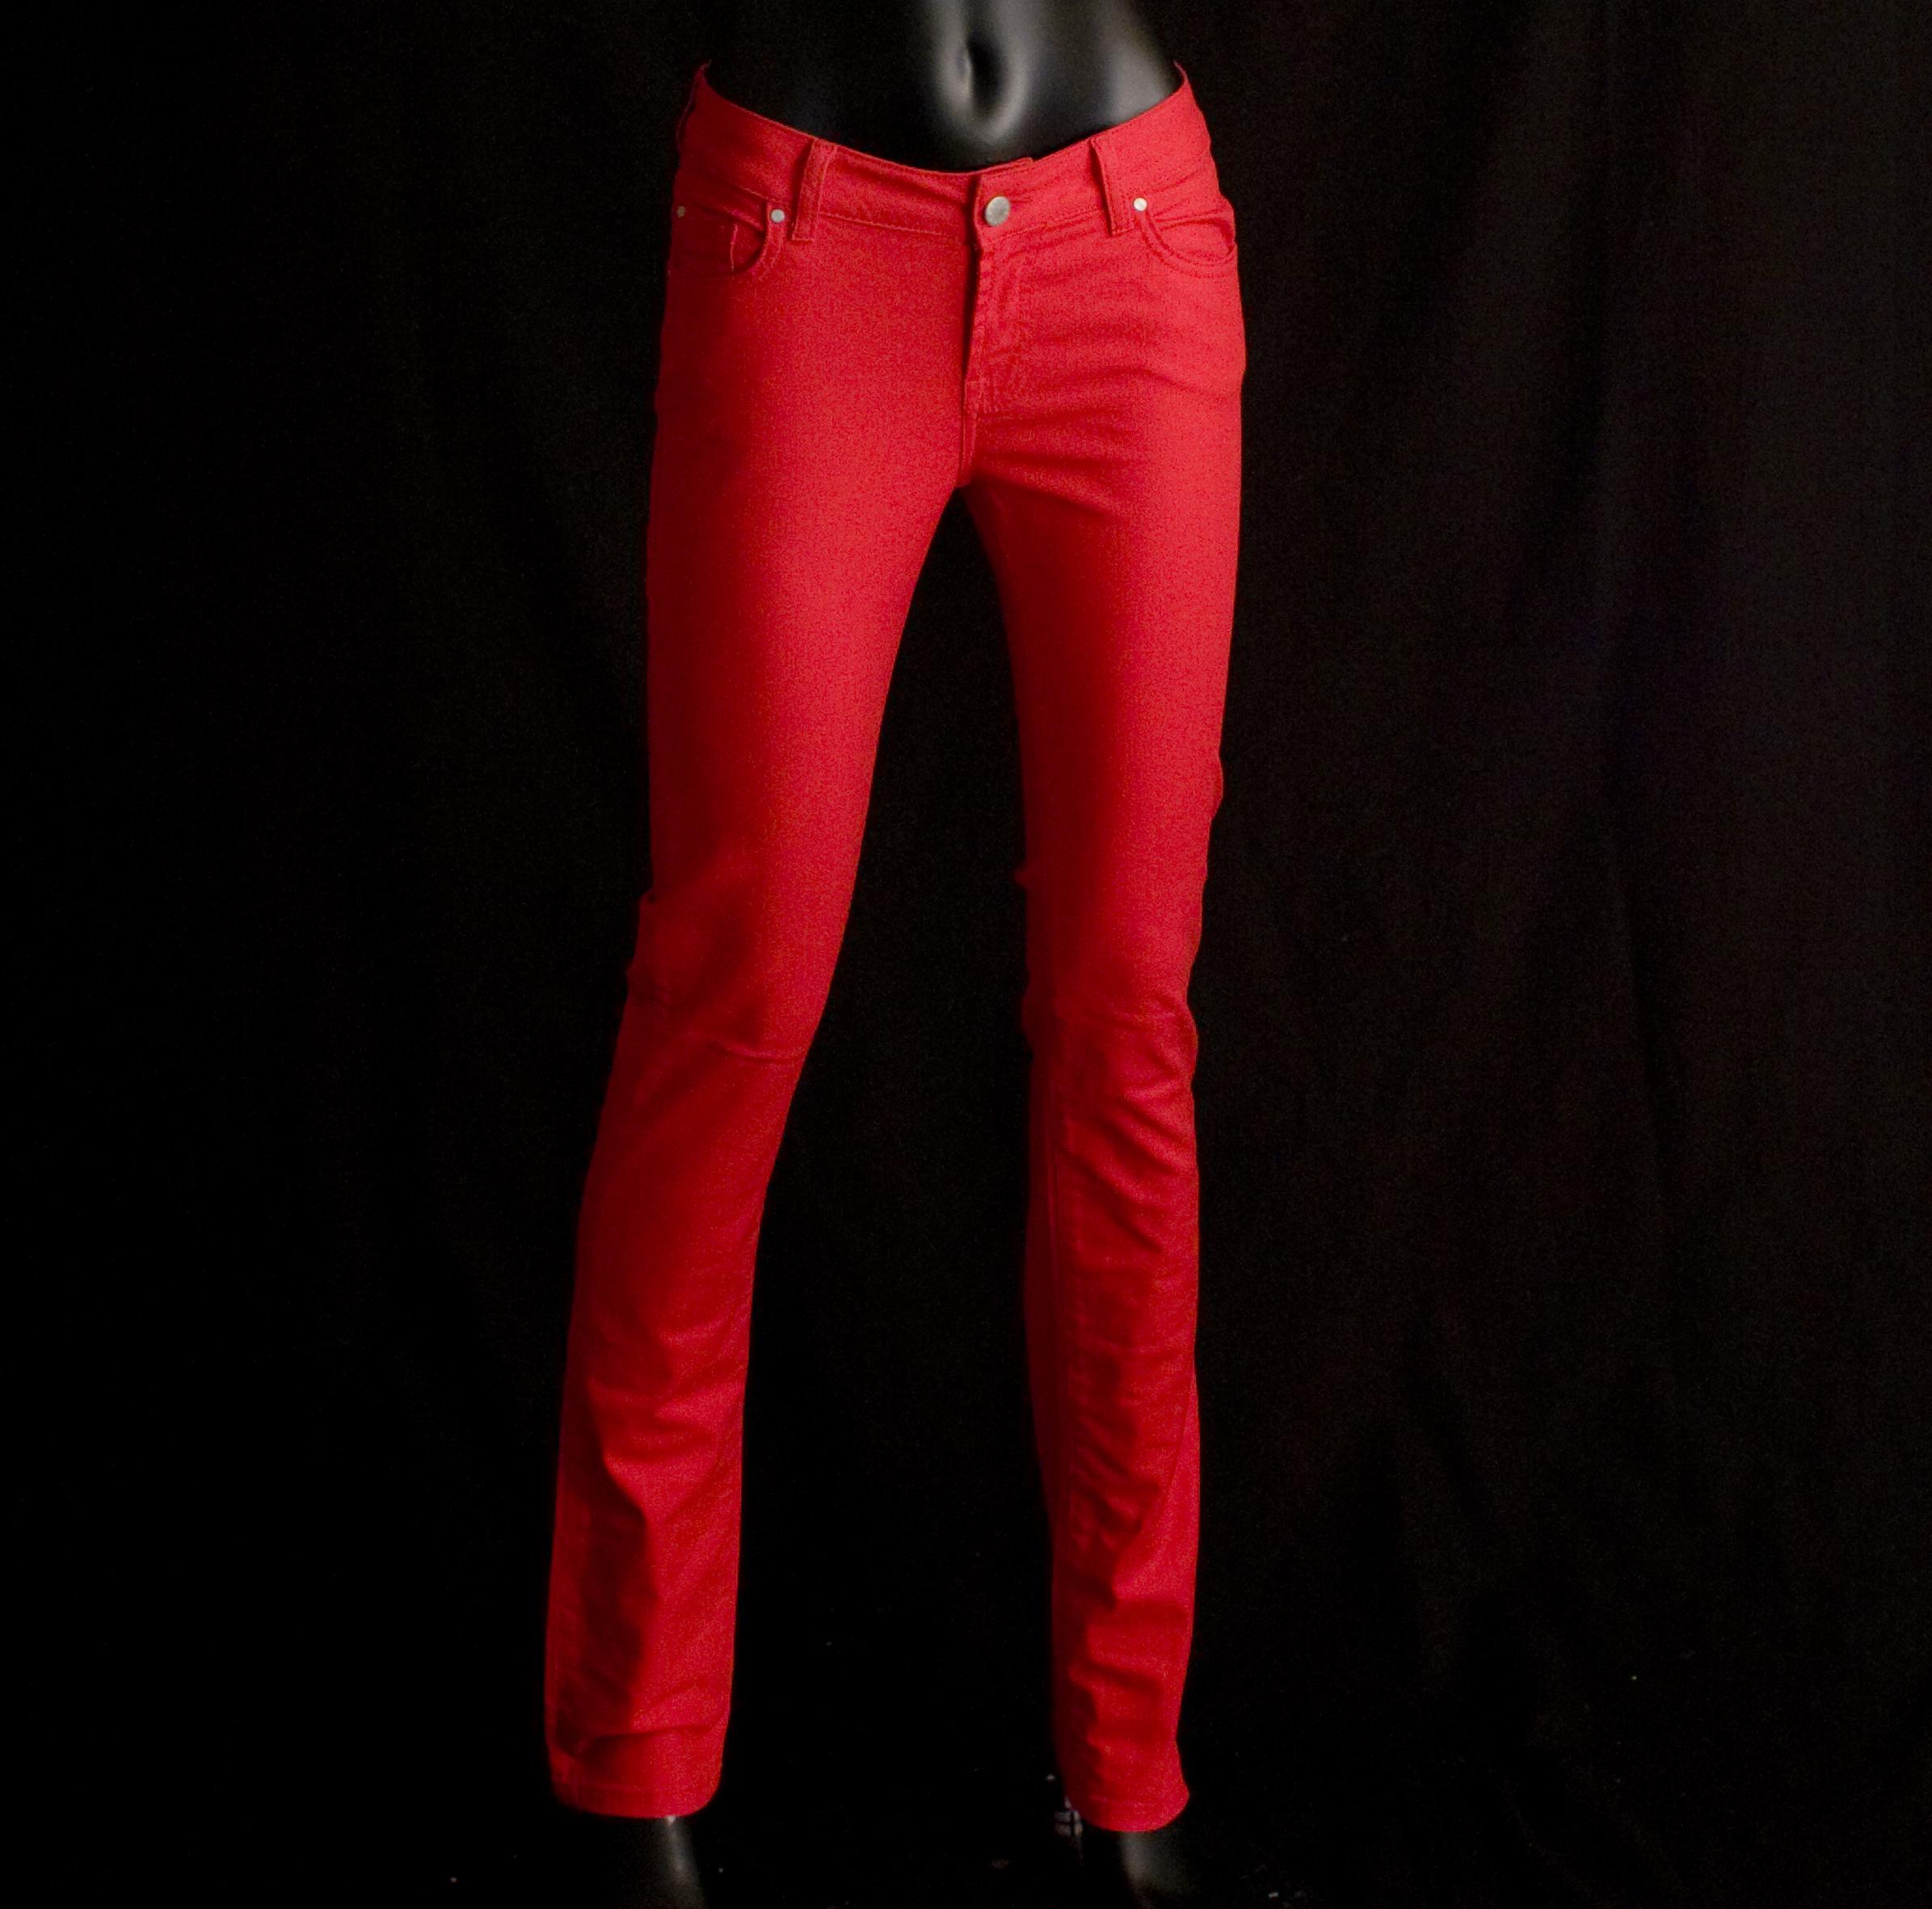 Mel C Red Jeans 300 HQ.jpg